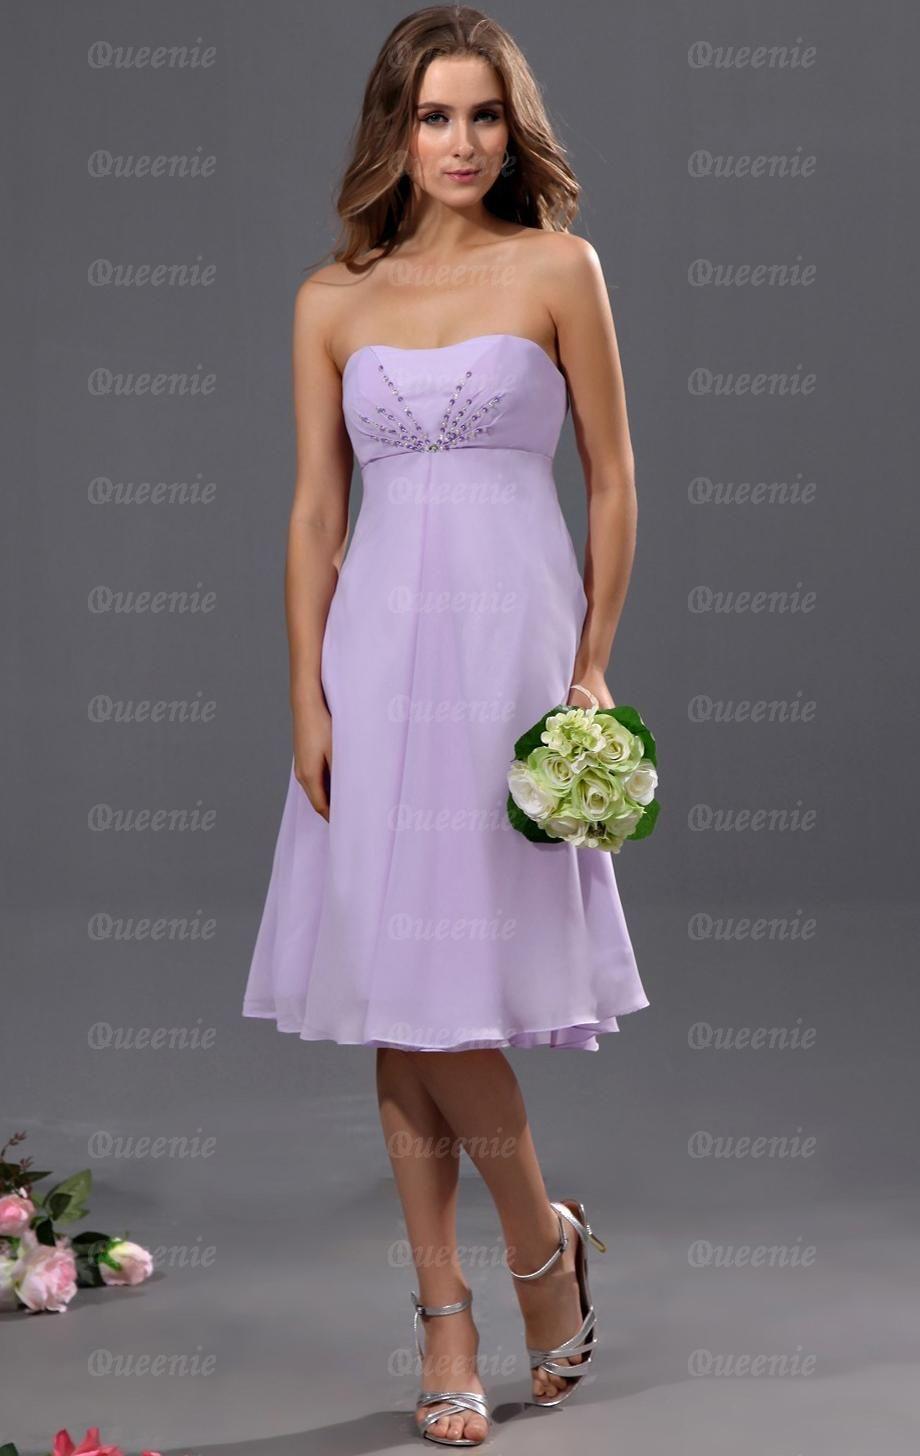 Online lilac bridesmaid dress bnnah0053 bridesmaid uk bodas online lilac bridesmaid dress bnnah0053 bridesmaid uk ombrellifo Gallery